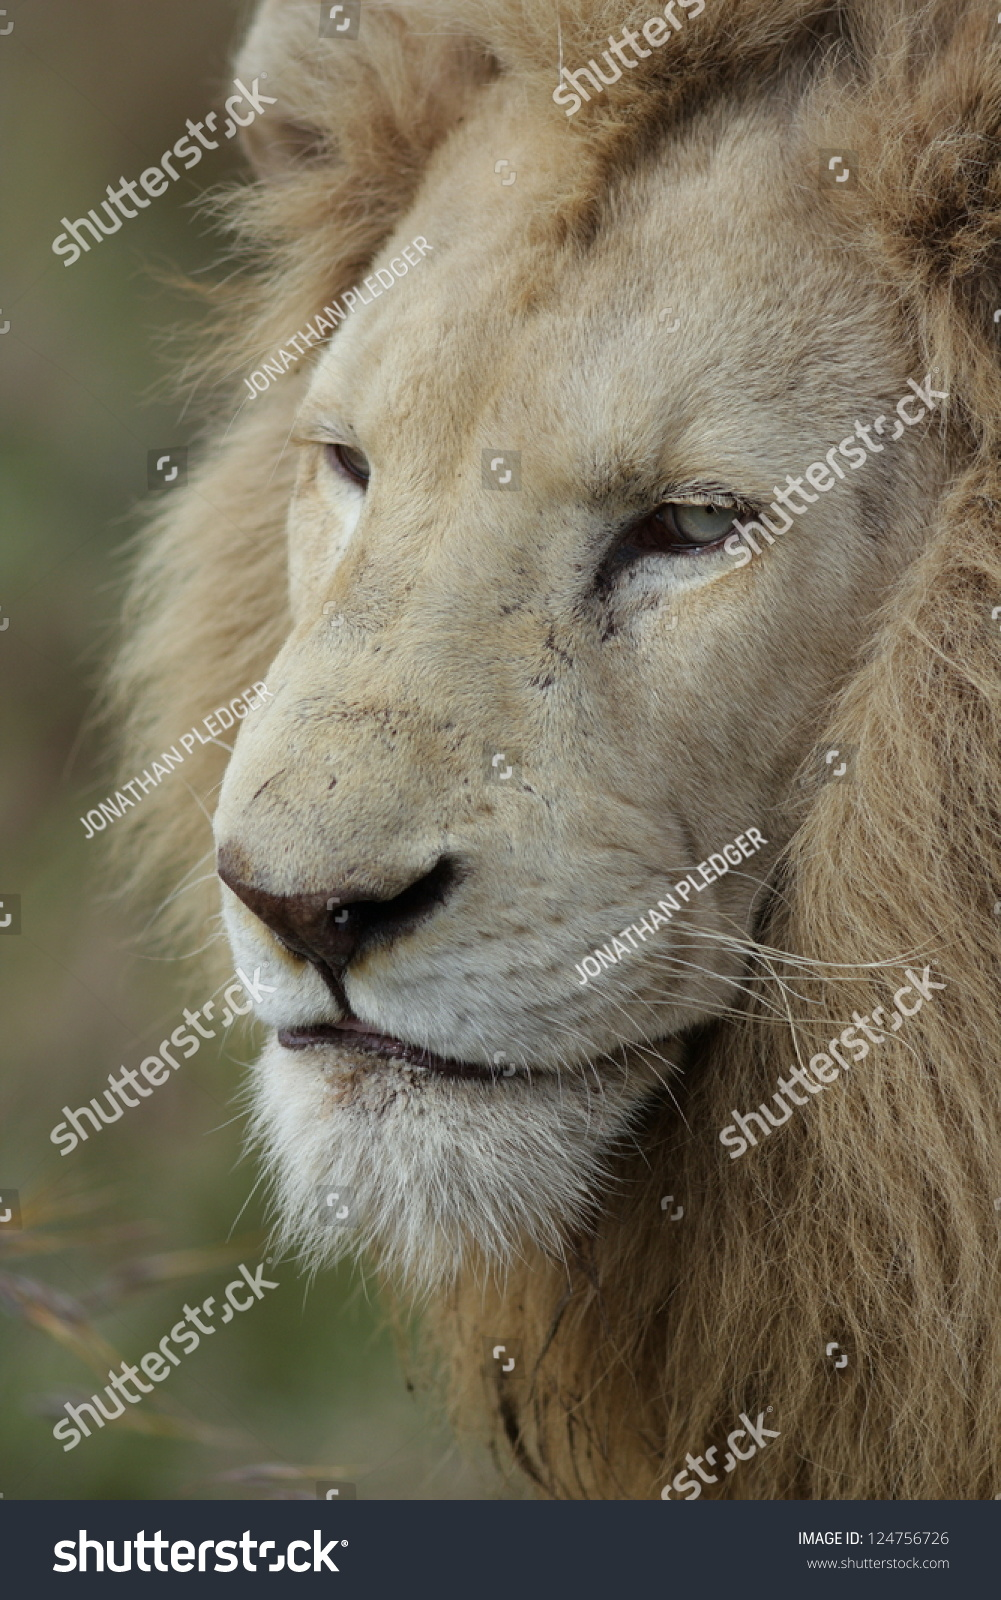 White lion face images - photo#26